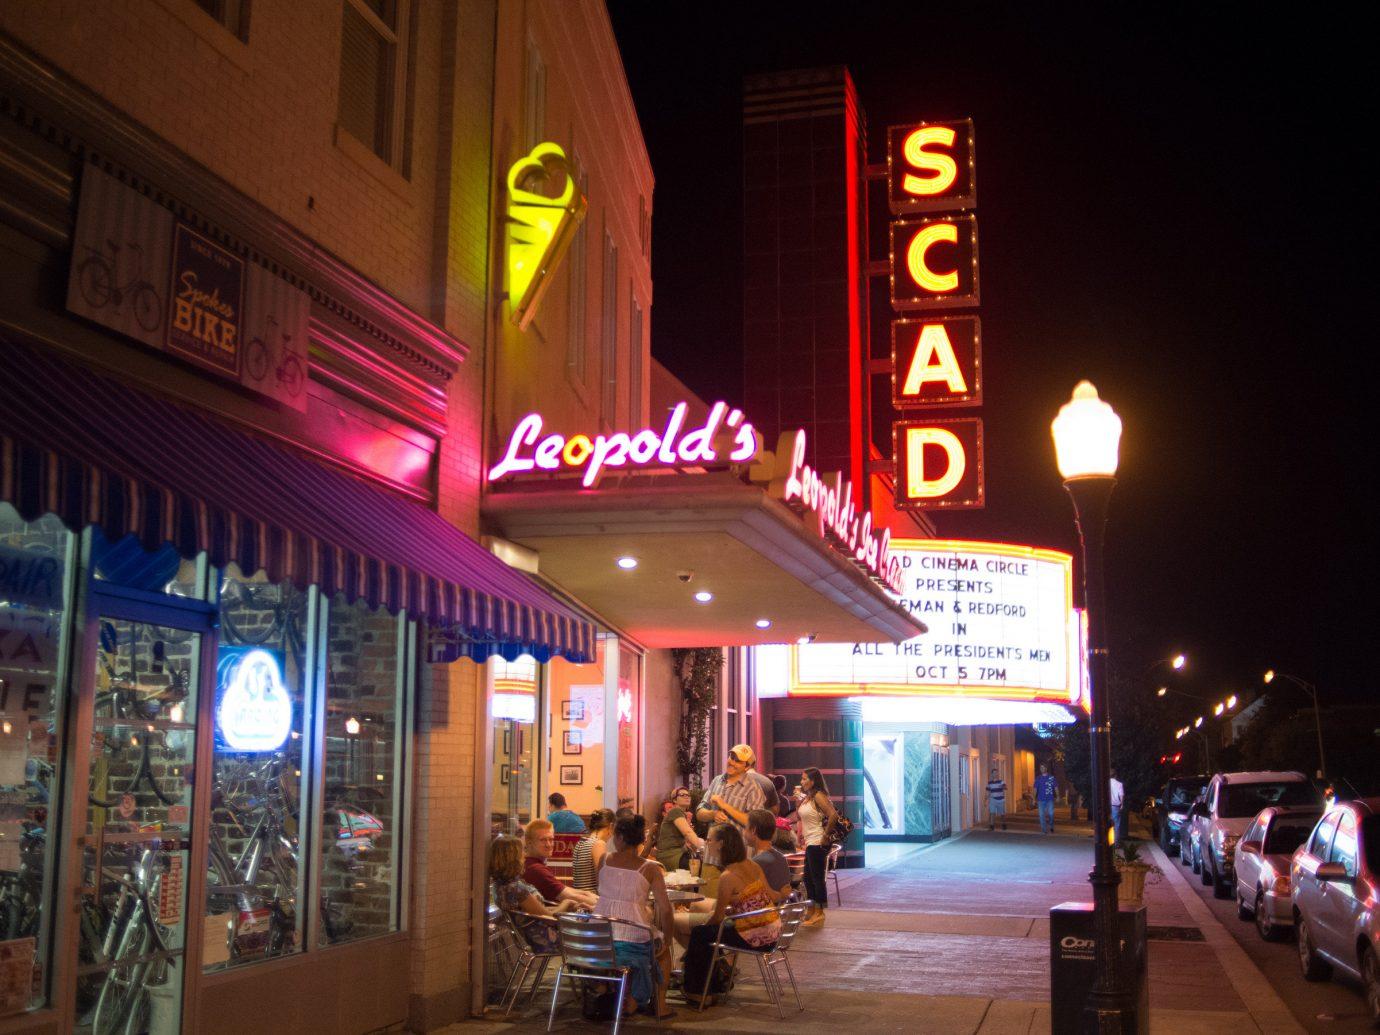 Leopold's Ice Cream in Savannah, GA